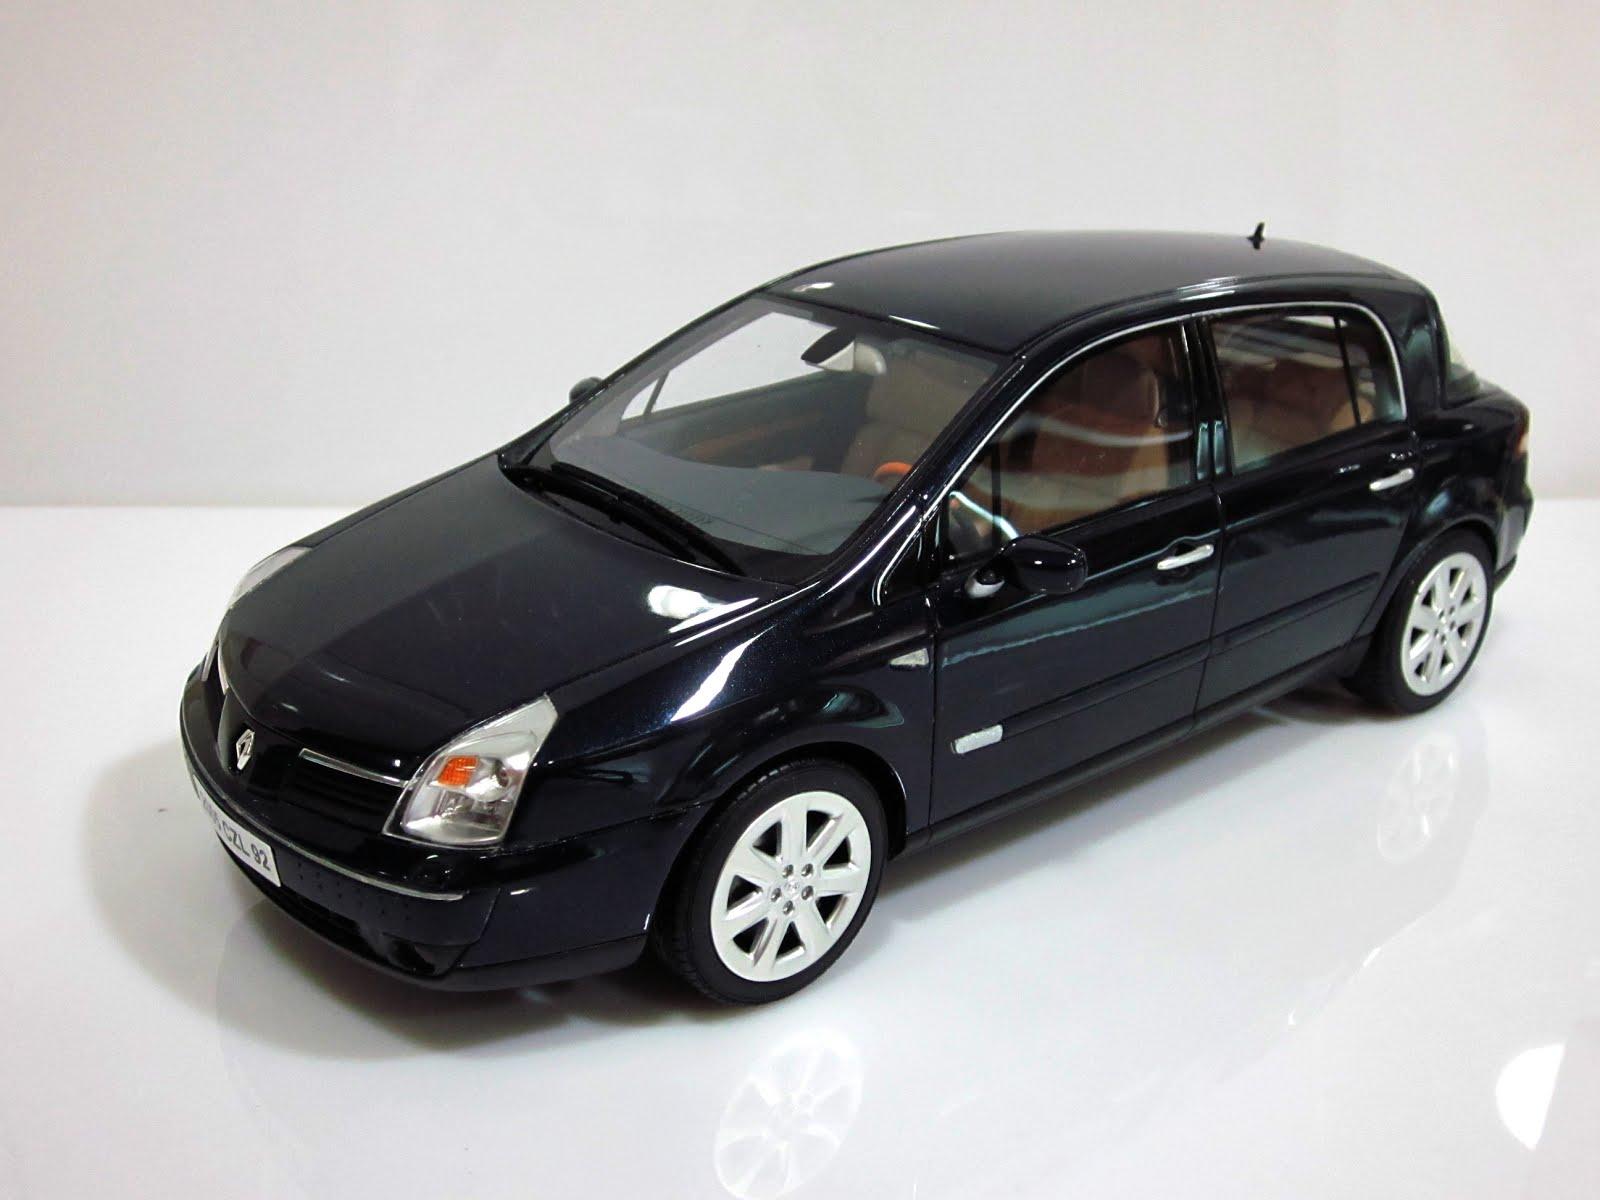 Renault Vel Satis 3.5 V6 24 '05 - Otto Mobile